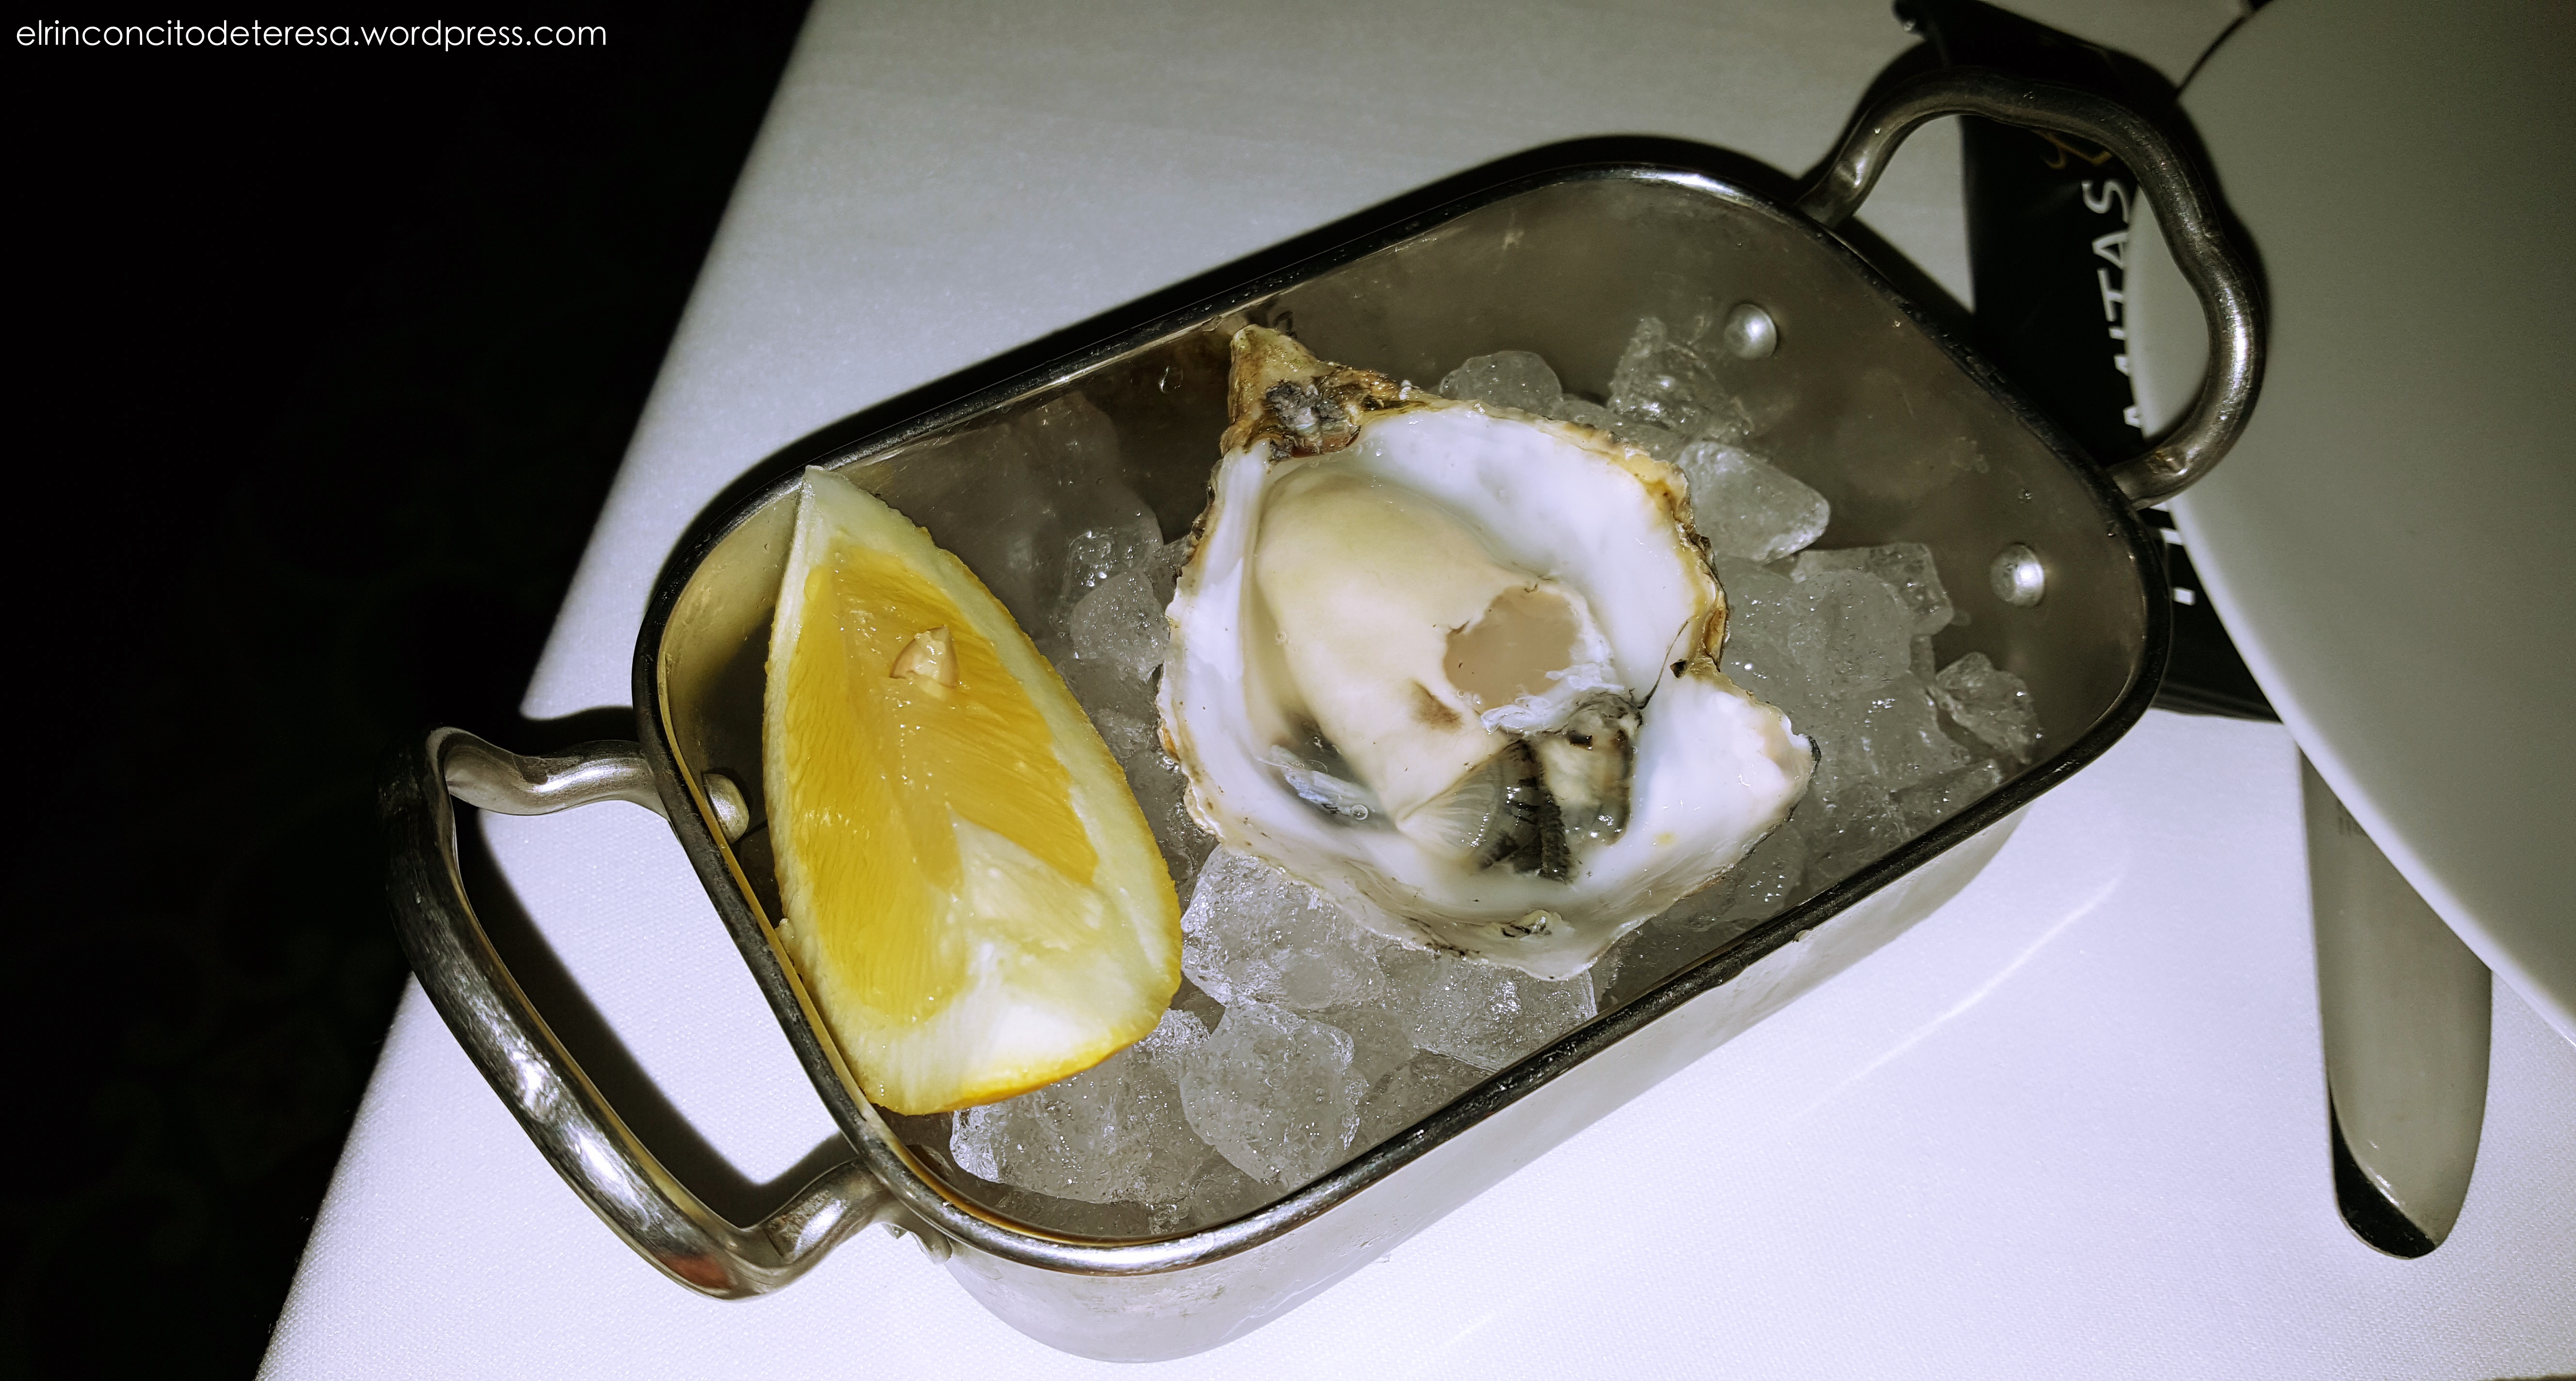 alba-granados-ostra-natural